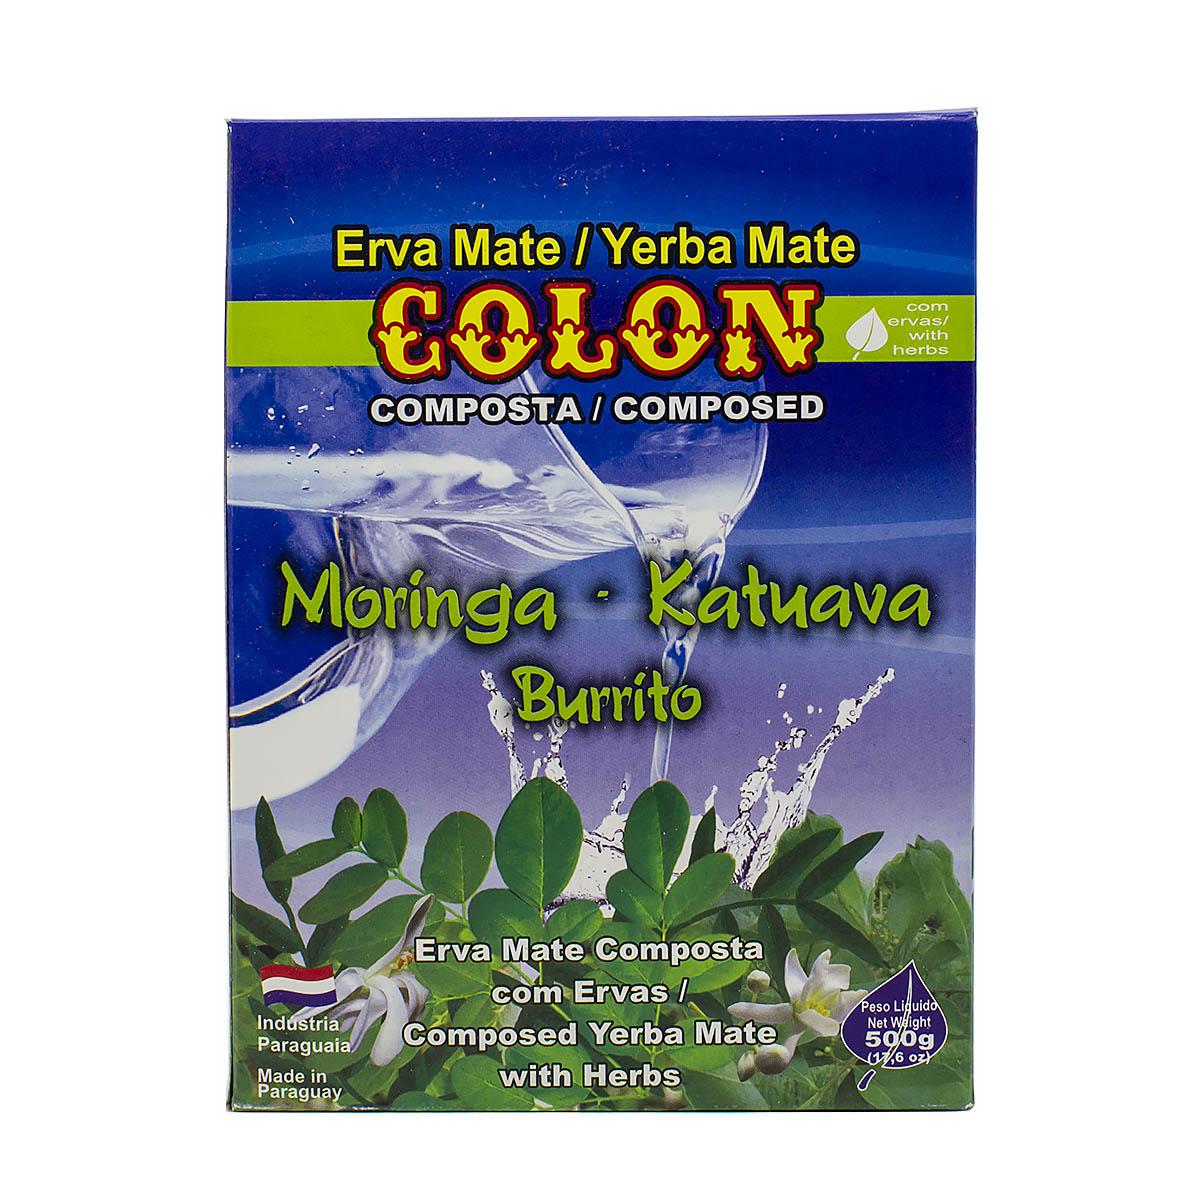 Мате Colon Moringa - Katuava - Burrito, 500 г мате colon menta boldo 500 г